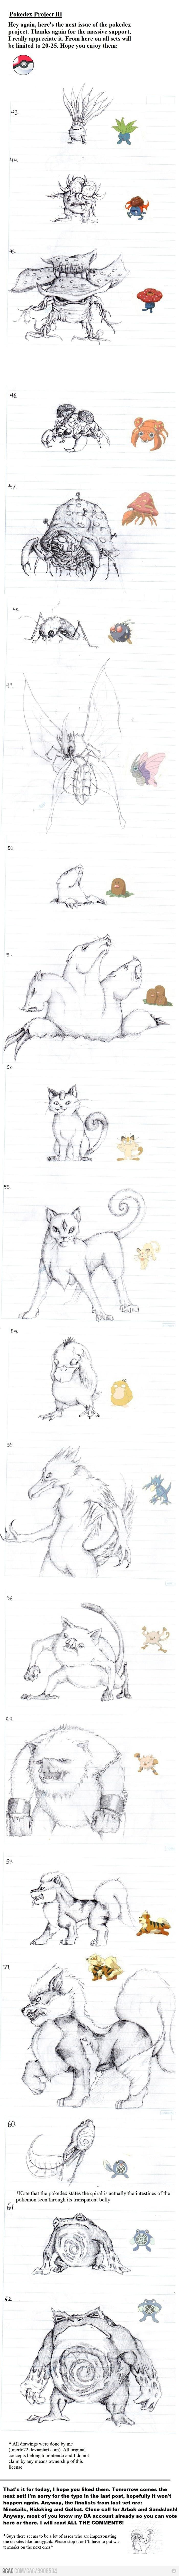 Pokemon re-imagined part 3